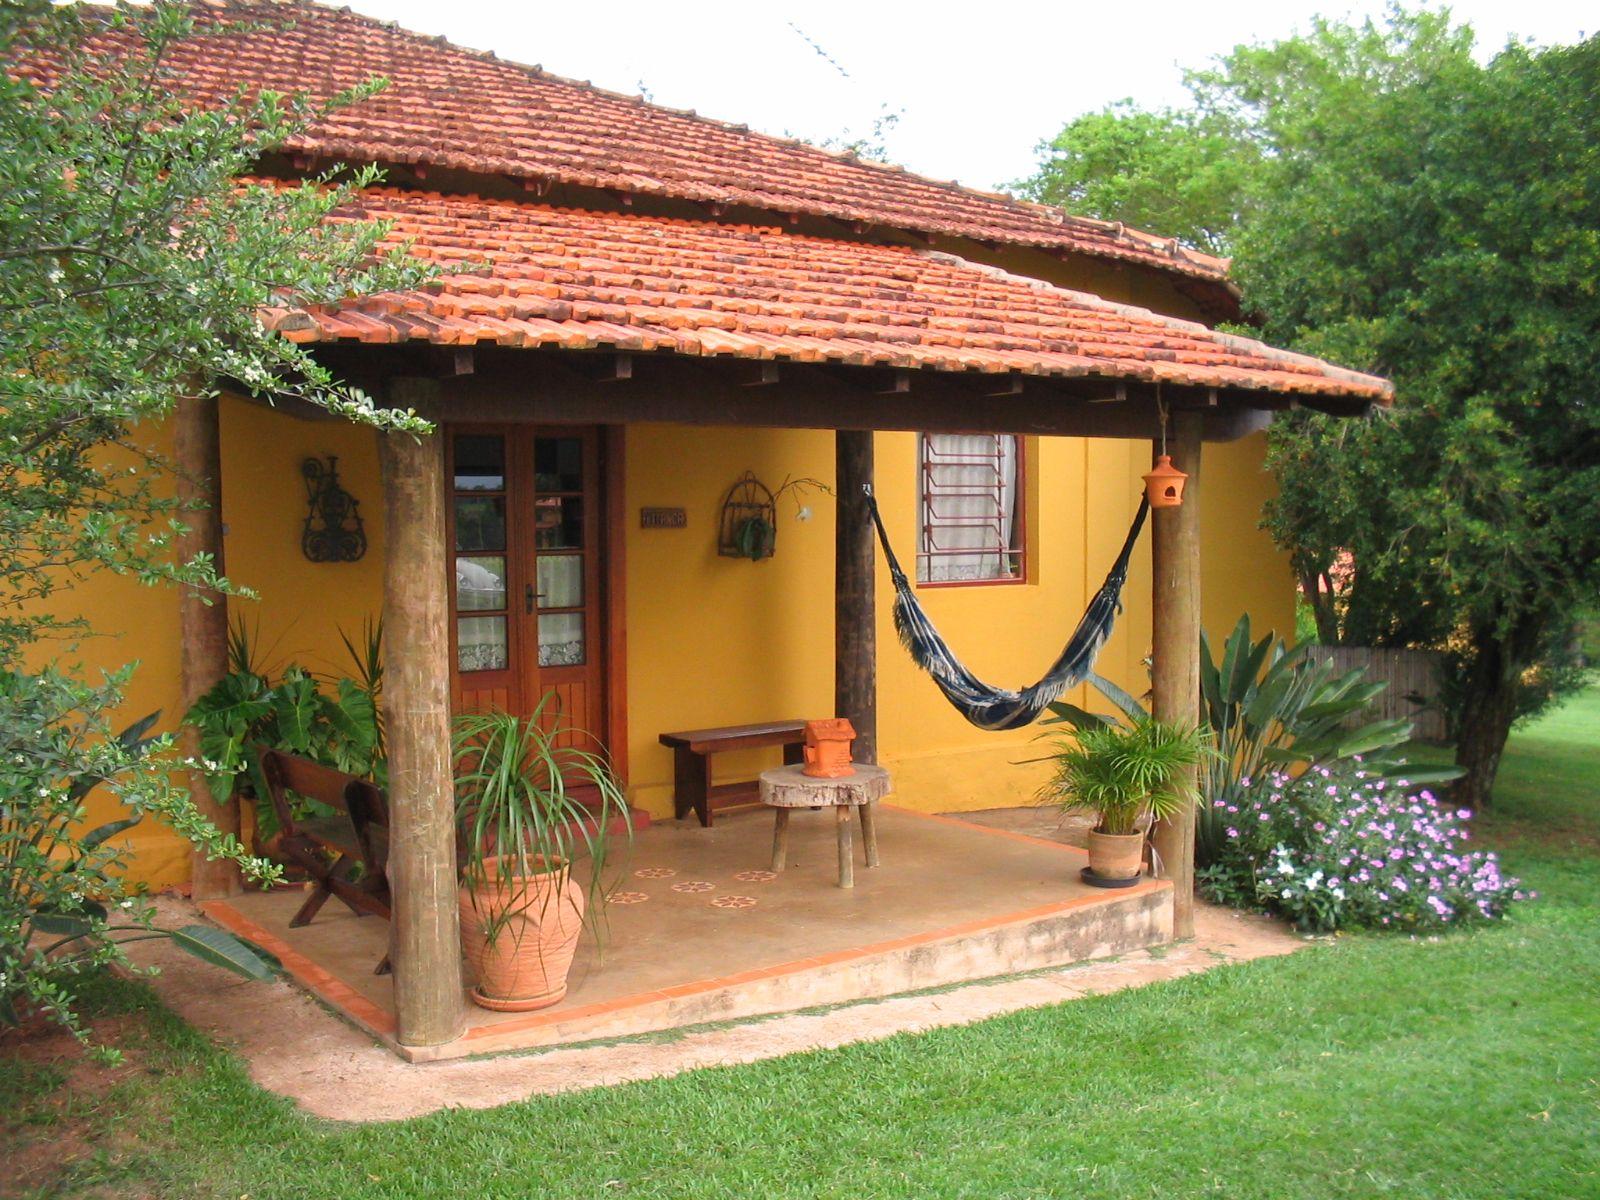 Pousada rural bem pequena pesquisa google casas de - Casas rurales de madera ...